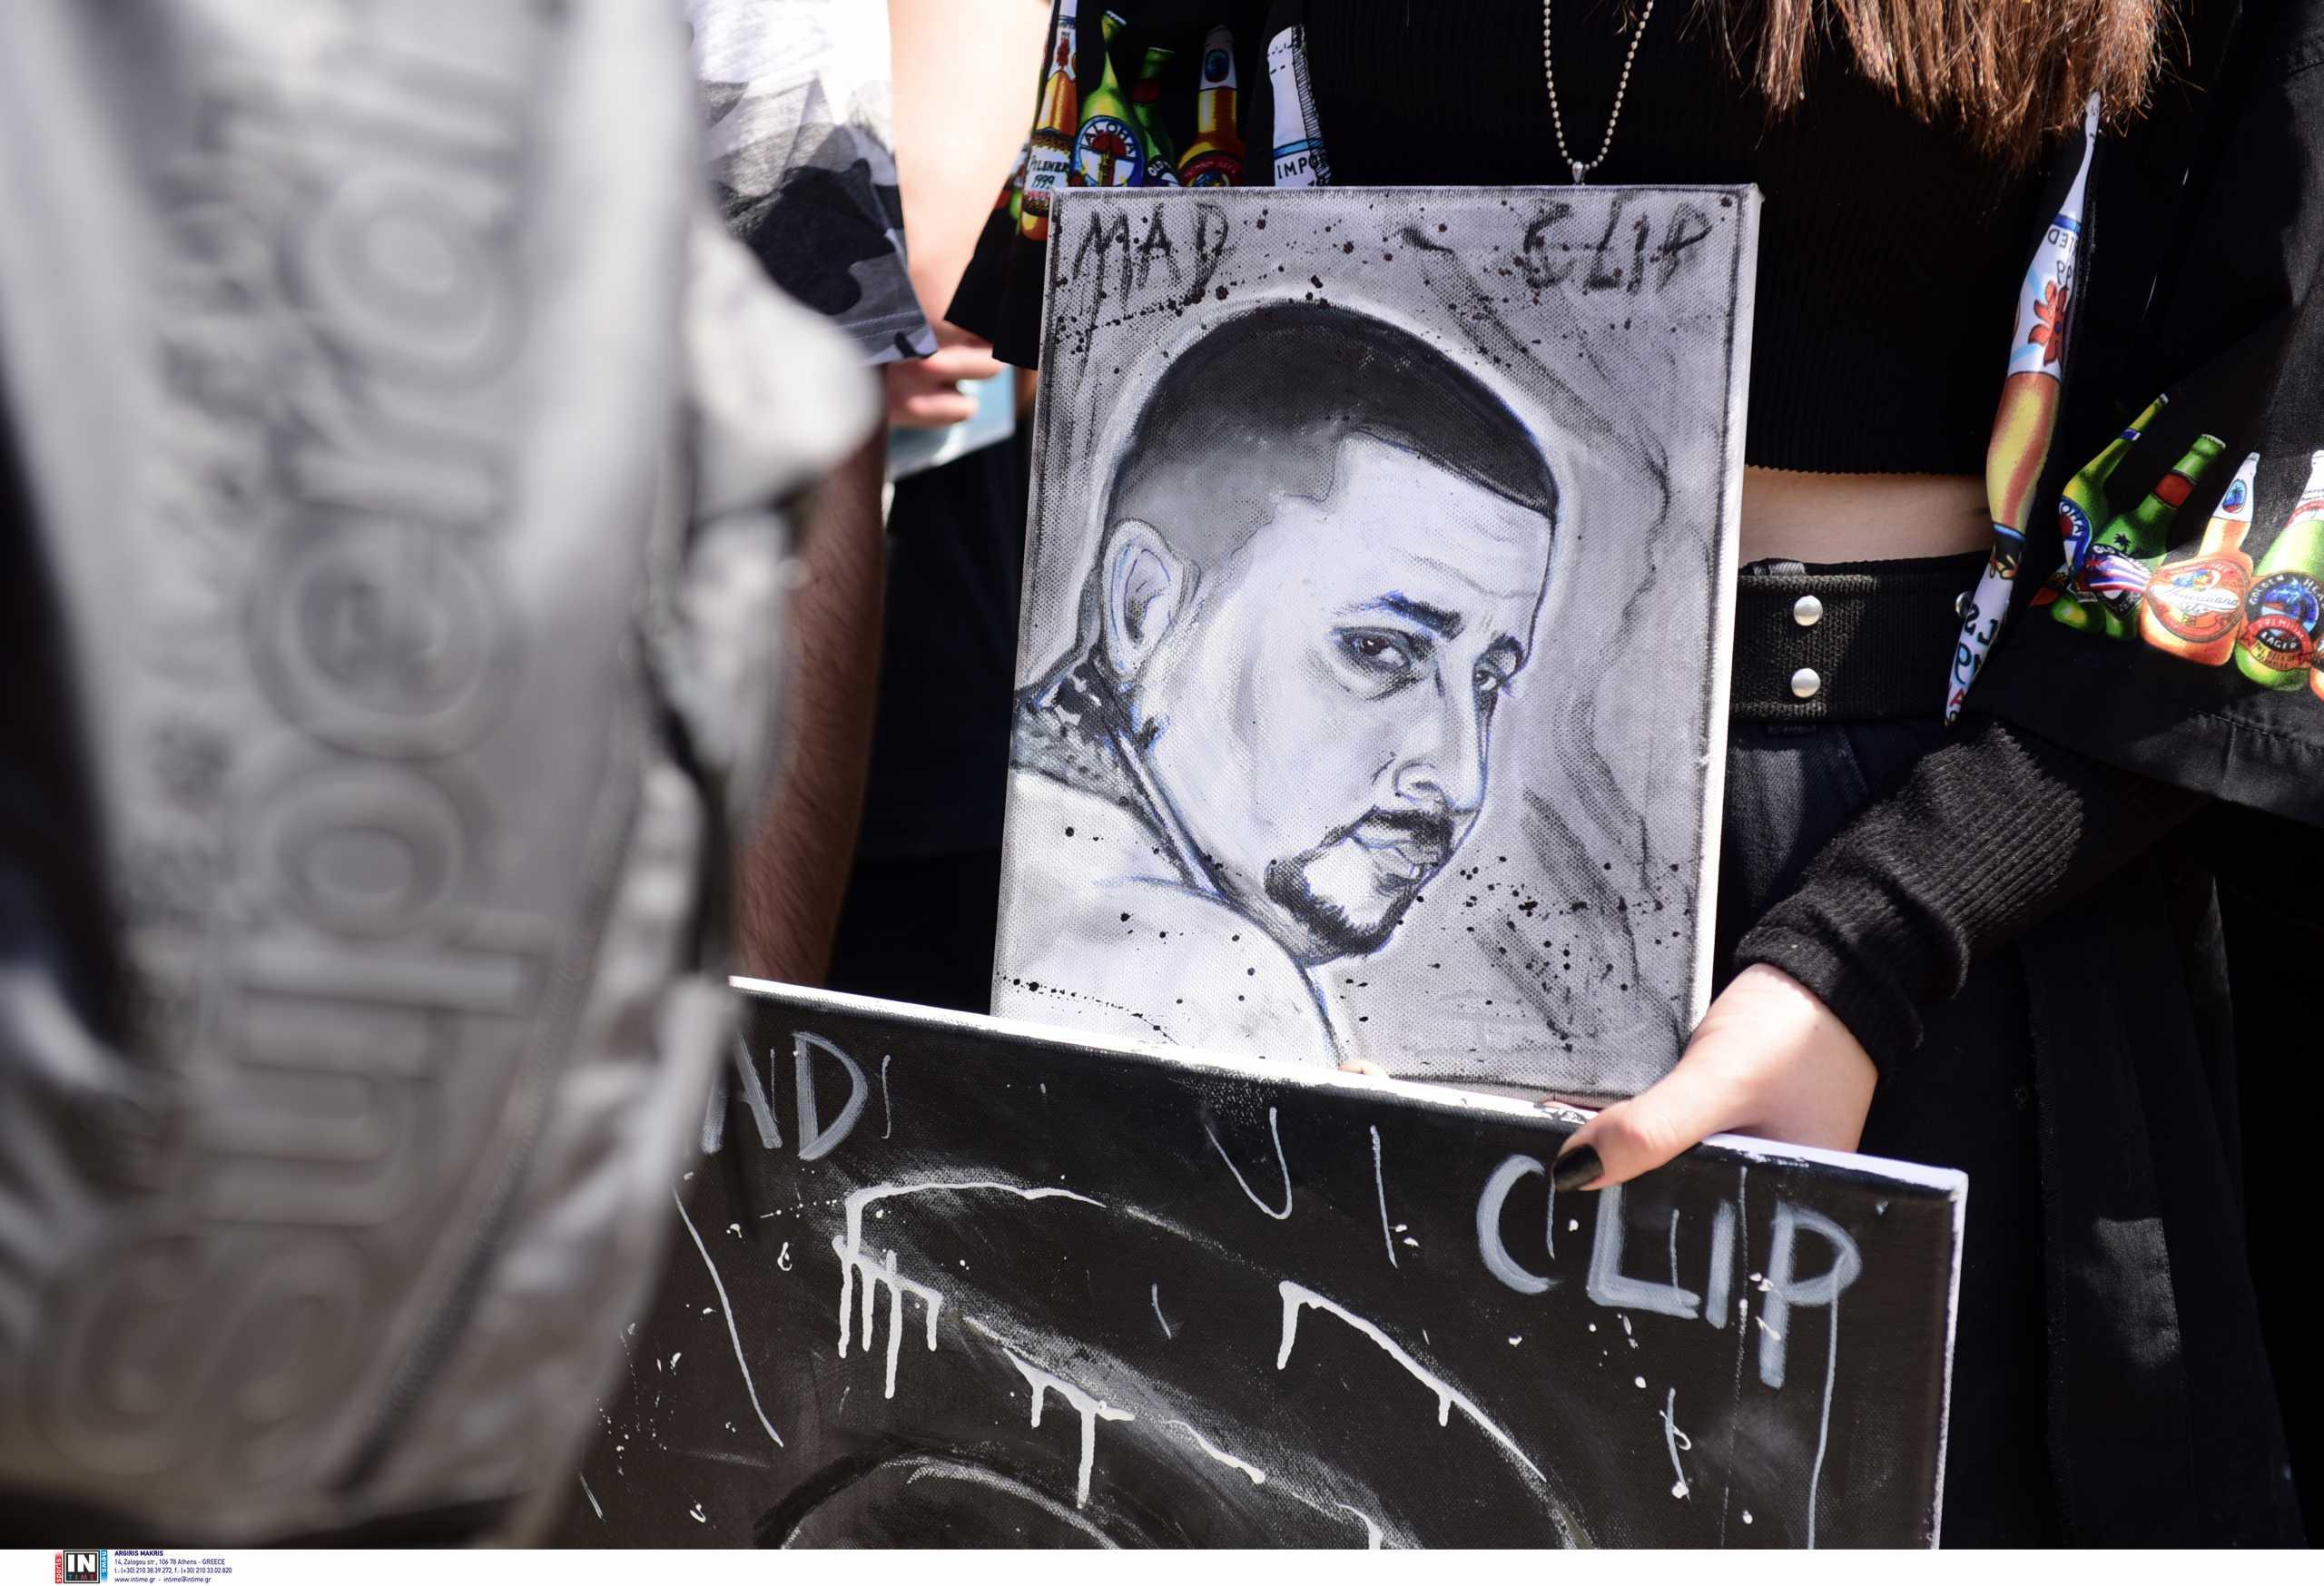 Mad Clip: «Ξέρω τι συνέβη με το τροχαίο» αποκαλύπτει ο πατέρας του τράπερ